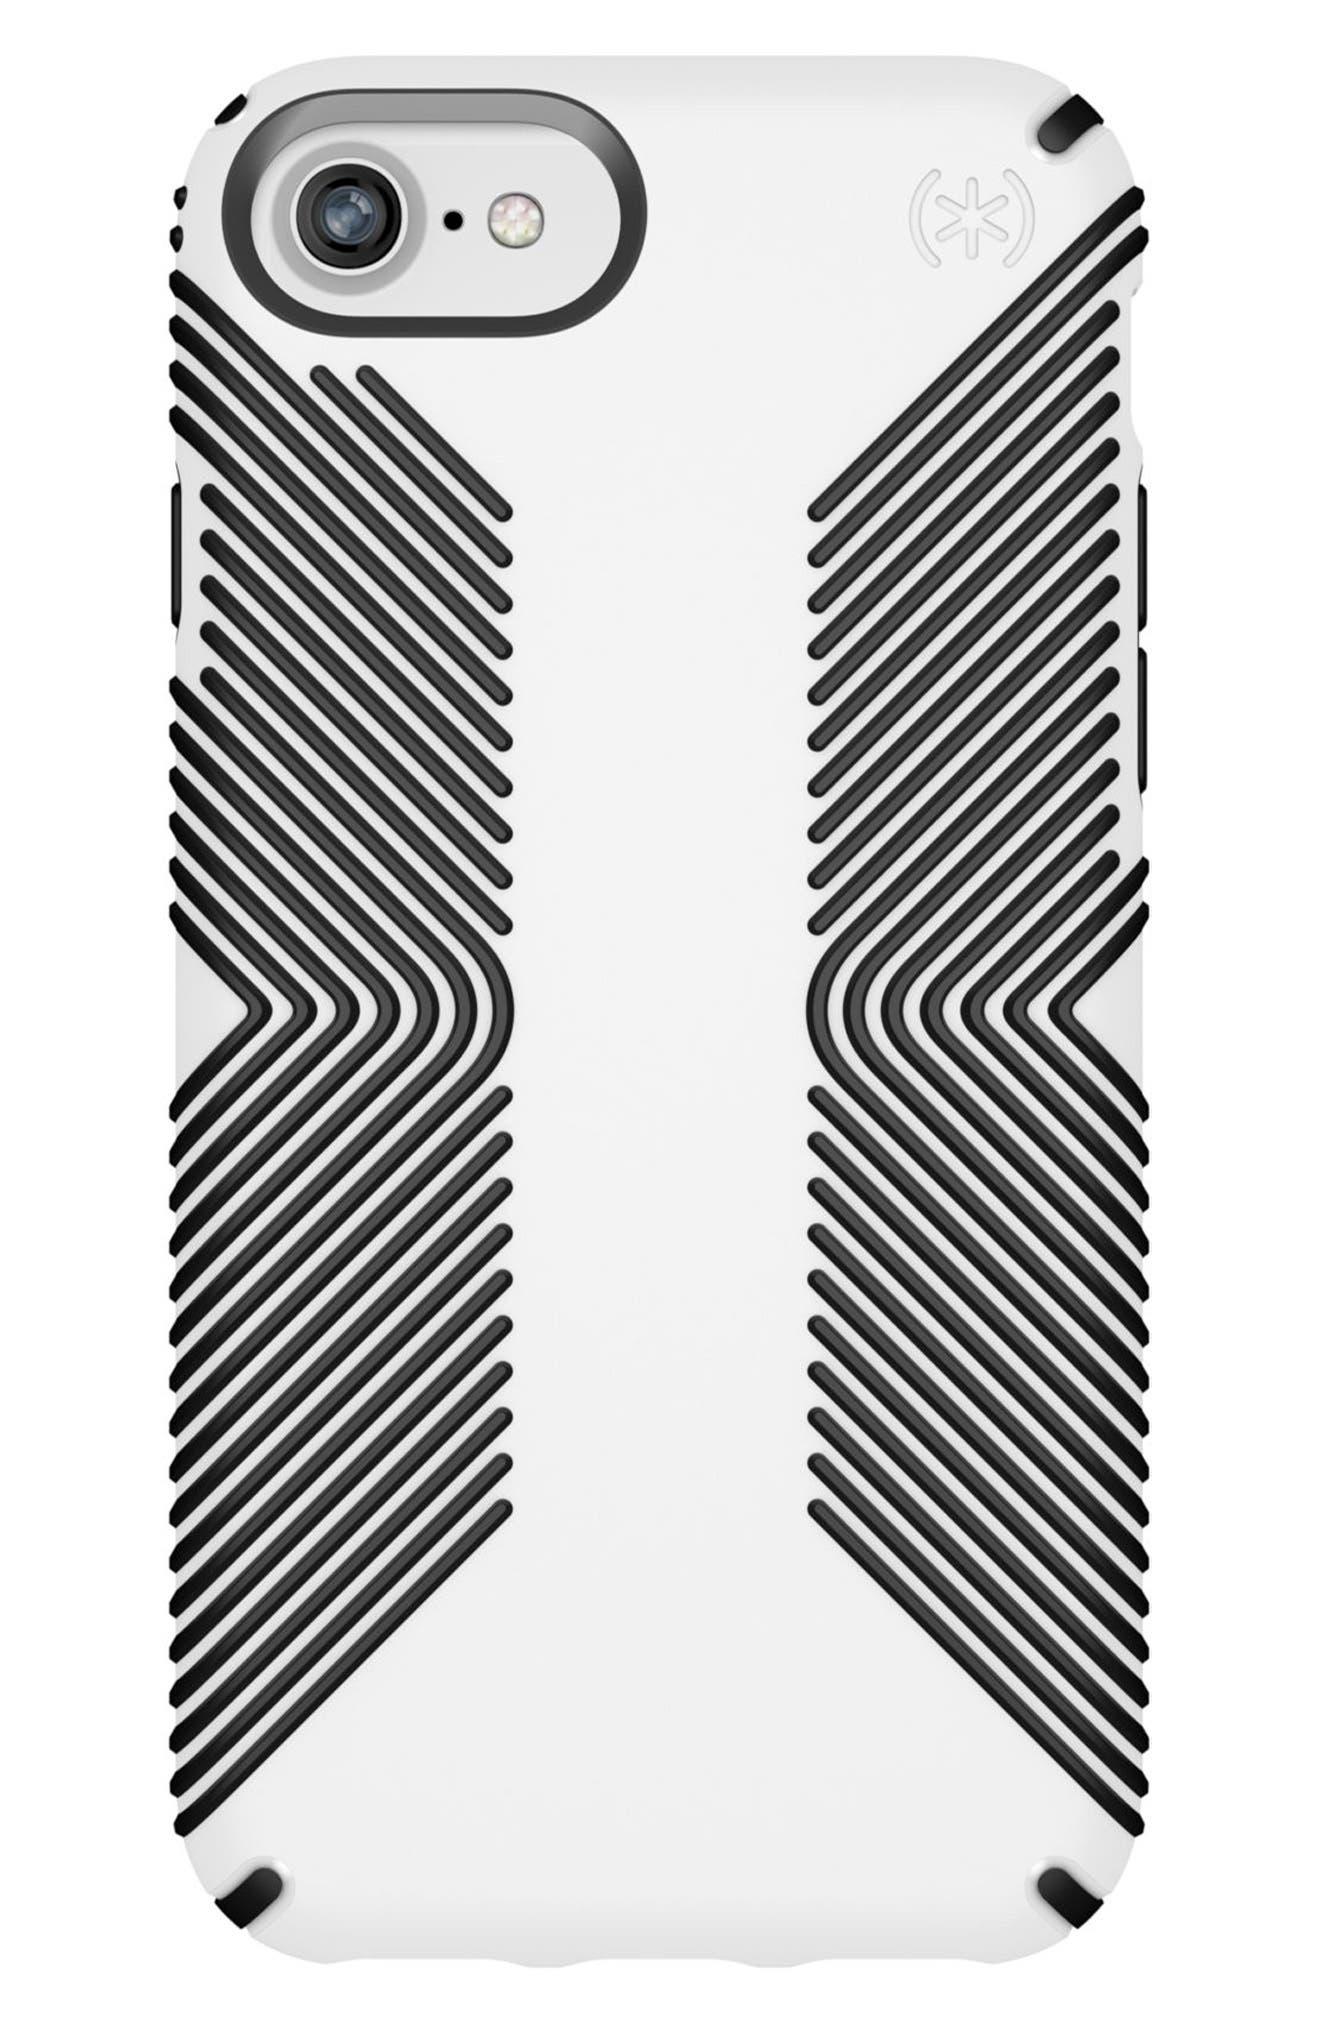 Grip iPhone 6/6s/7/8 Case,                             Main thumbnail 1, color,                             White/ Black